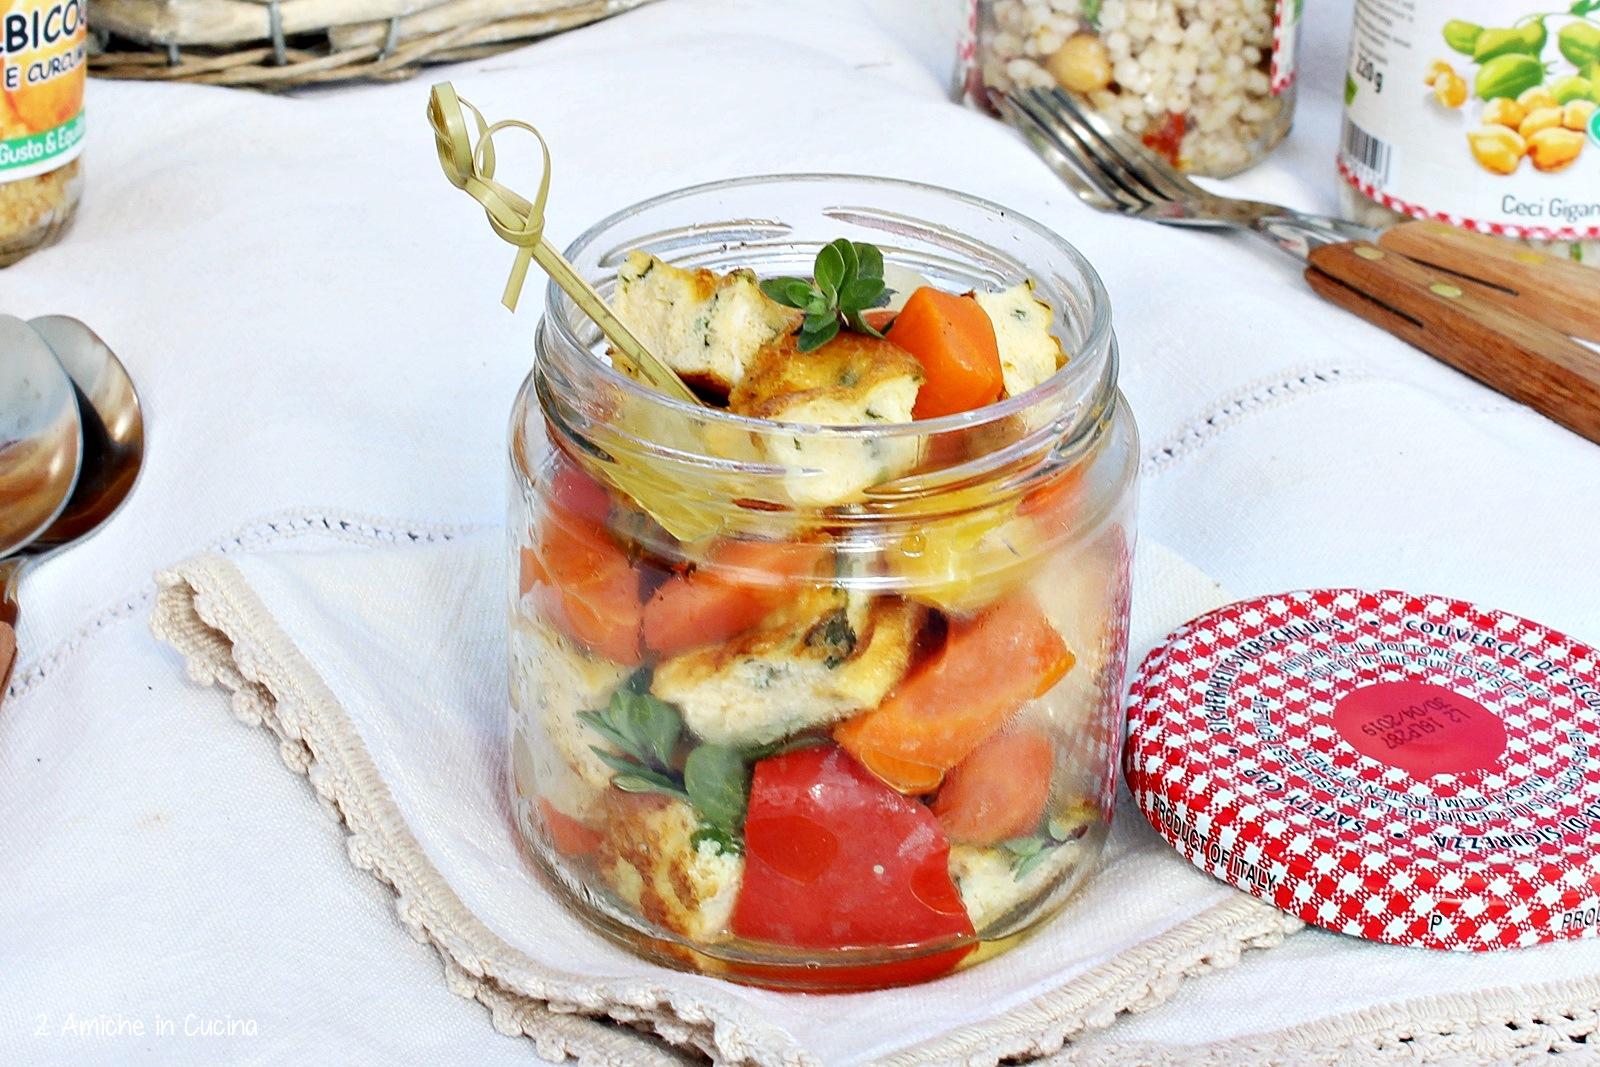 Frittata alle erbette con verdure in agrodolce